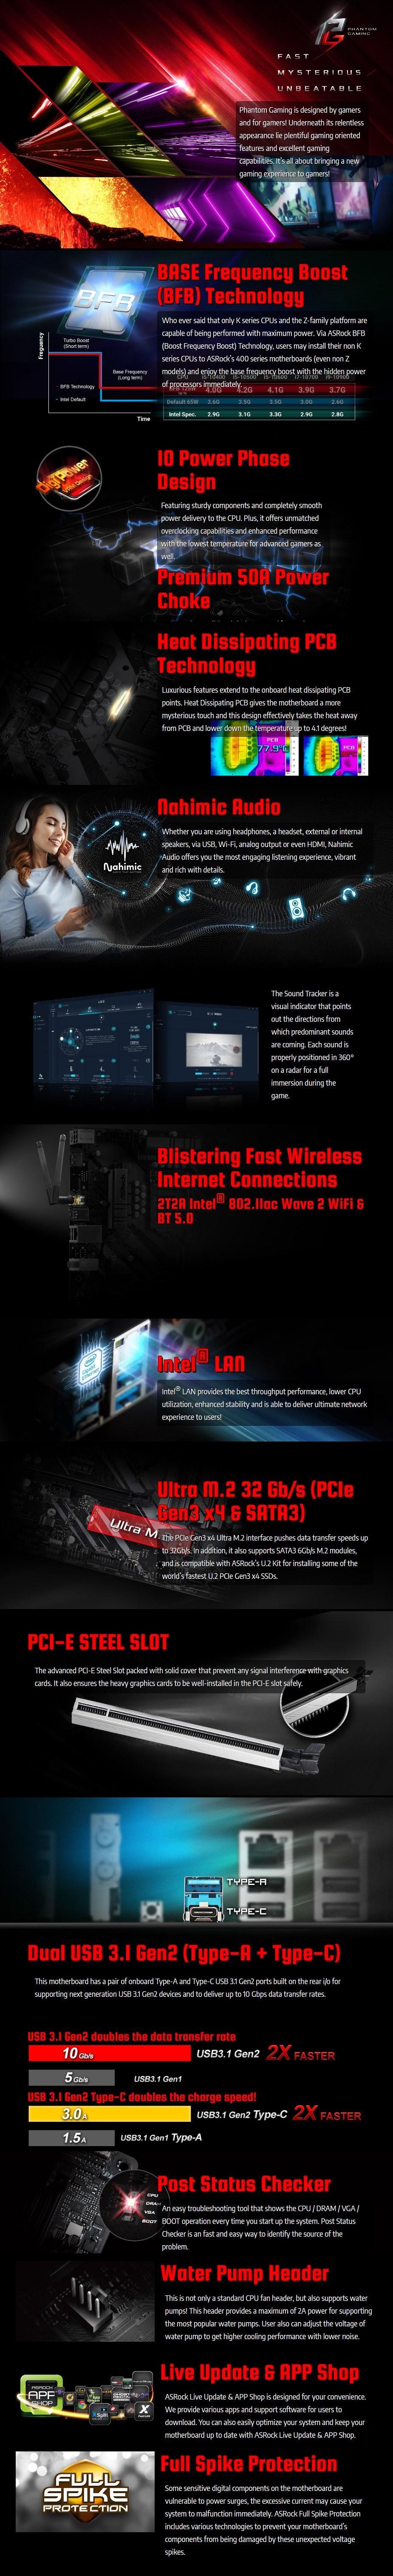 ASRock Z490 Phantom Gaming 4/ac LGA 1200 ATX Motherboard - Overview 1